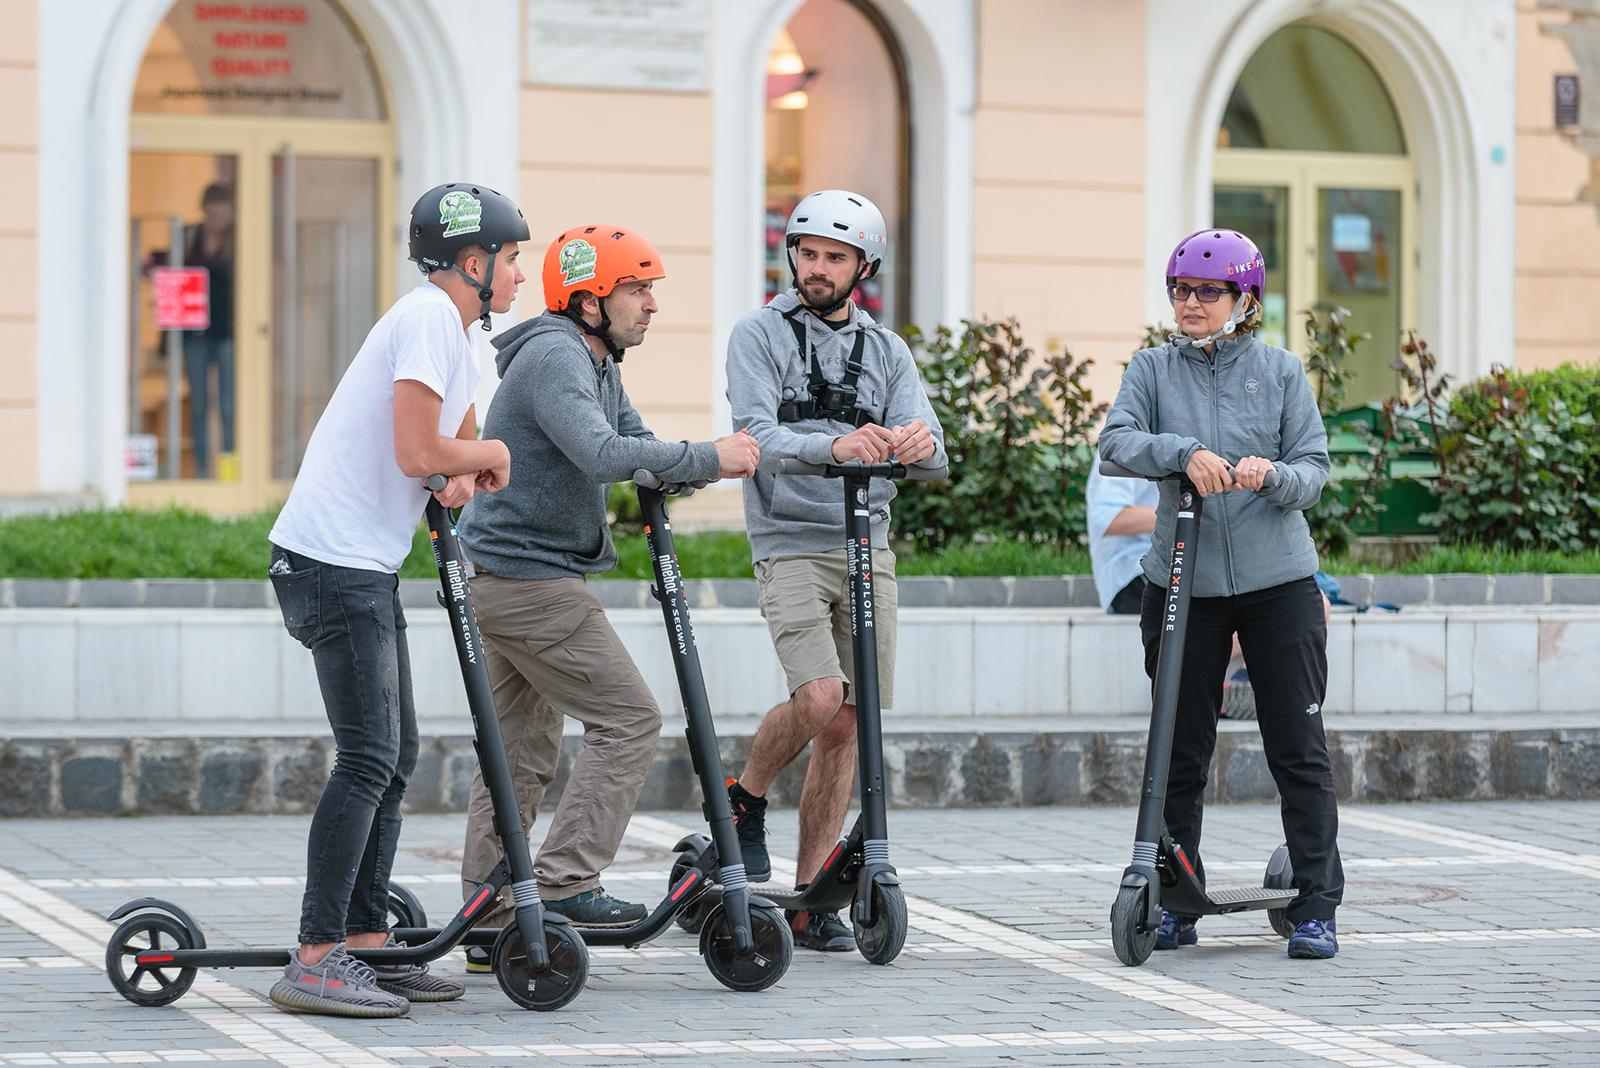 Exploreaza Brasovul si imprejurimile sale cu trotineta electrica, impreuna cu echipa Bikexplore